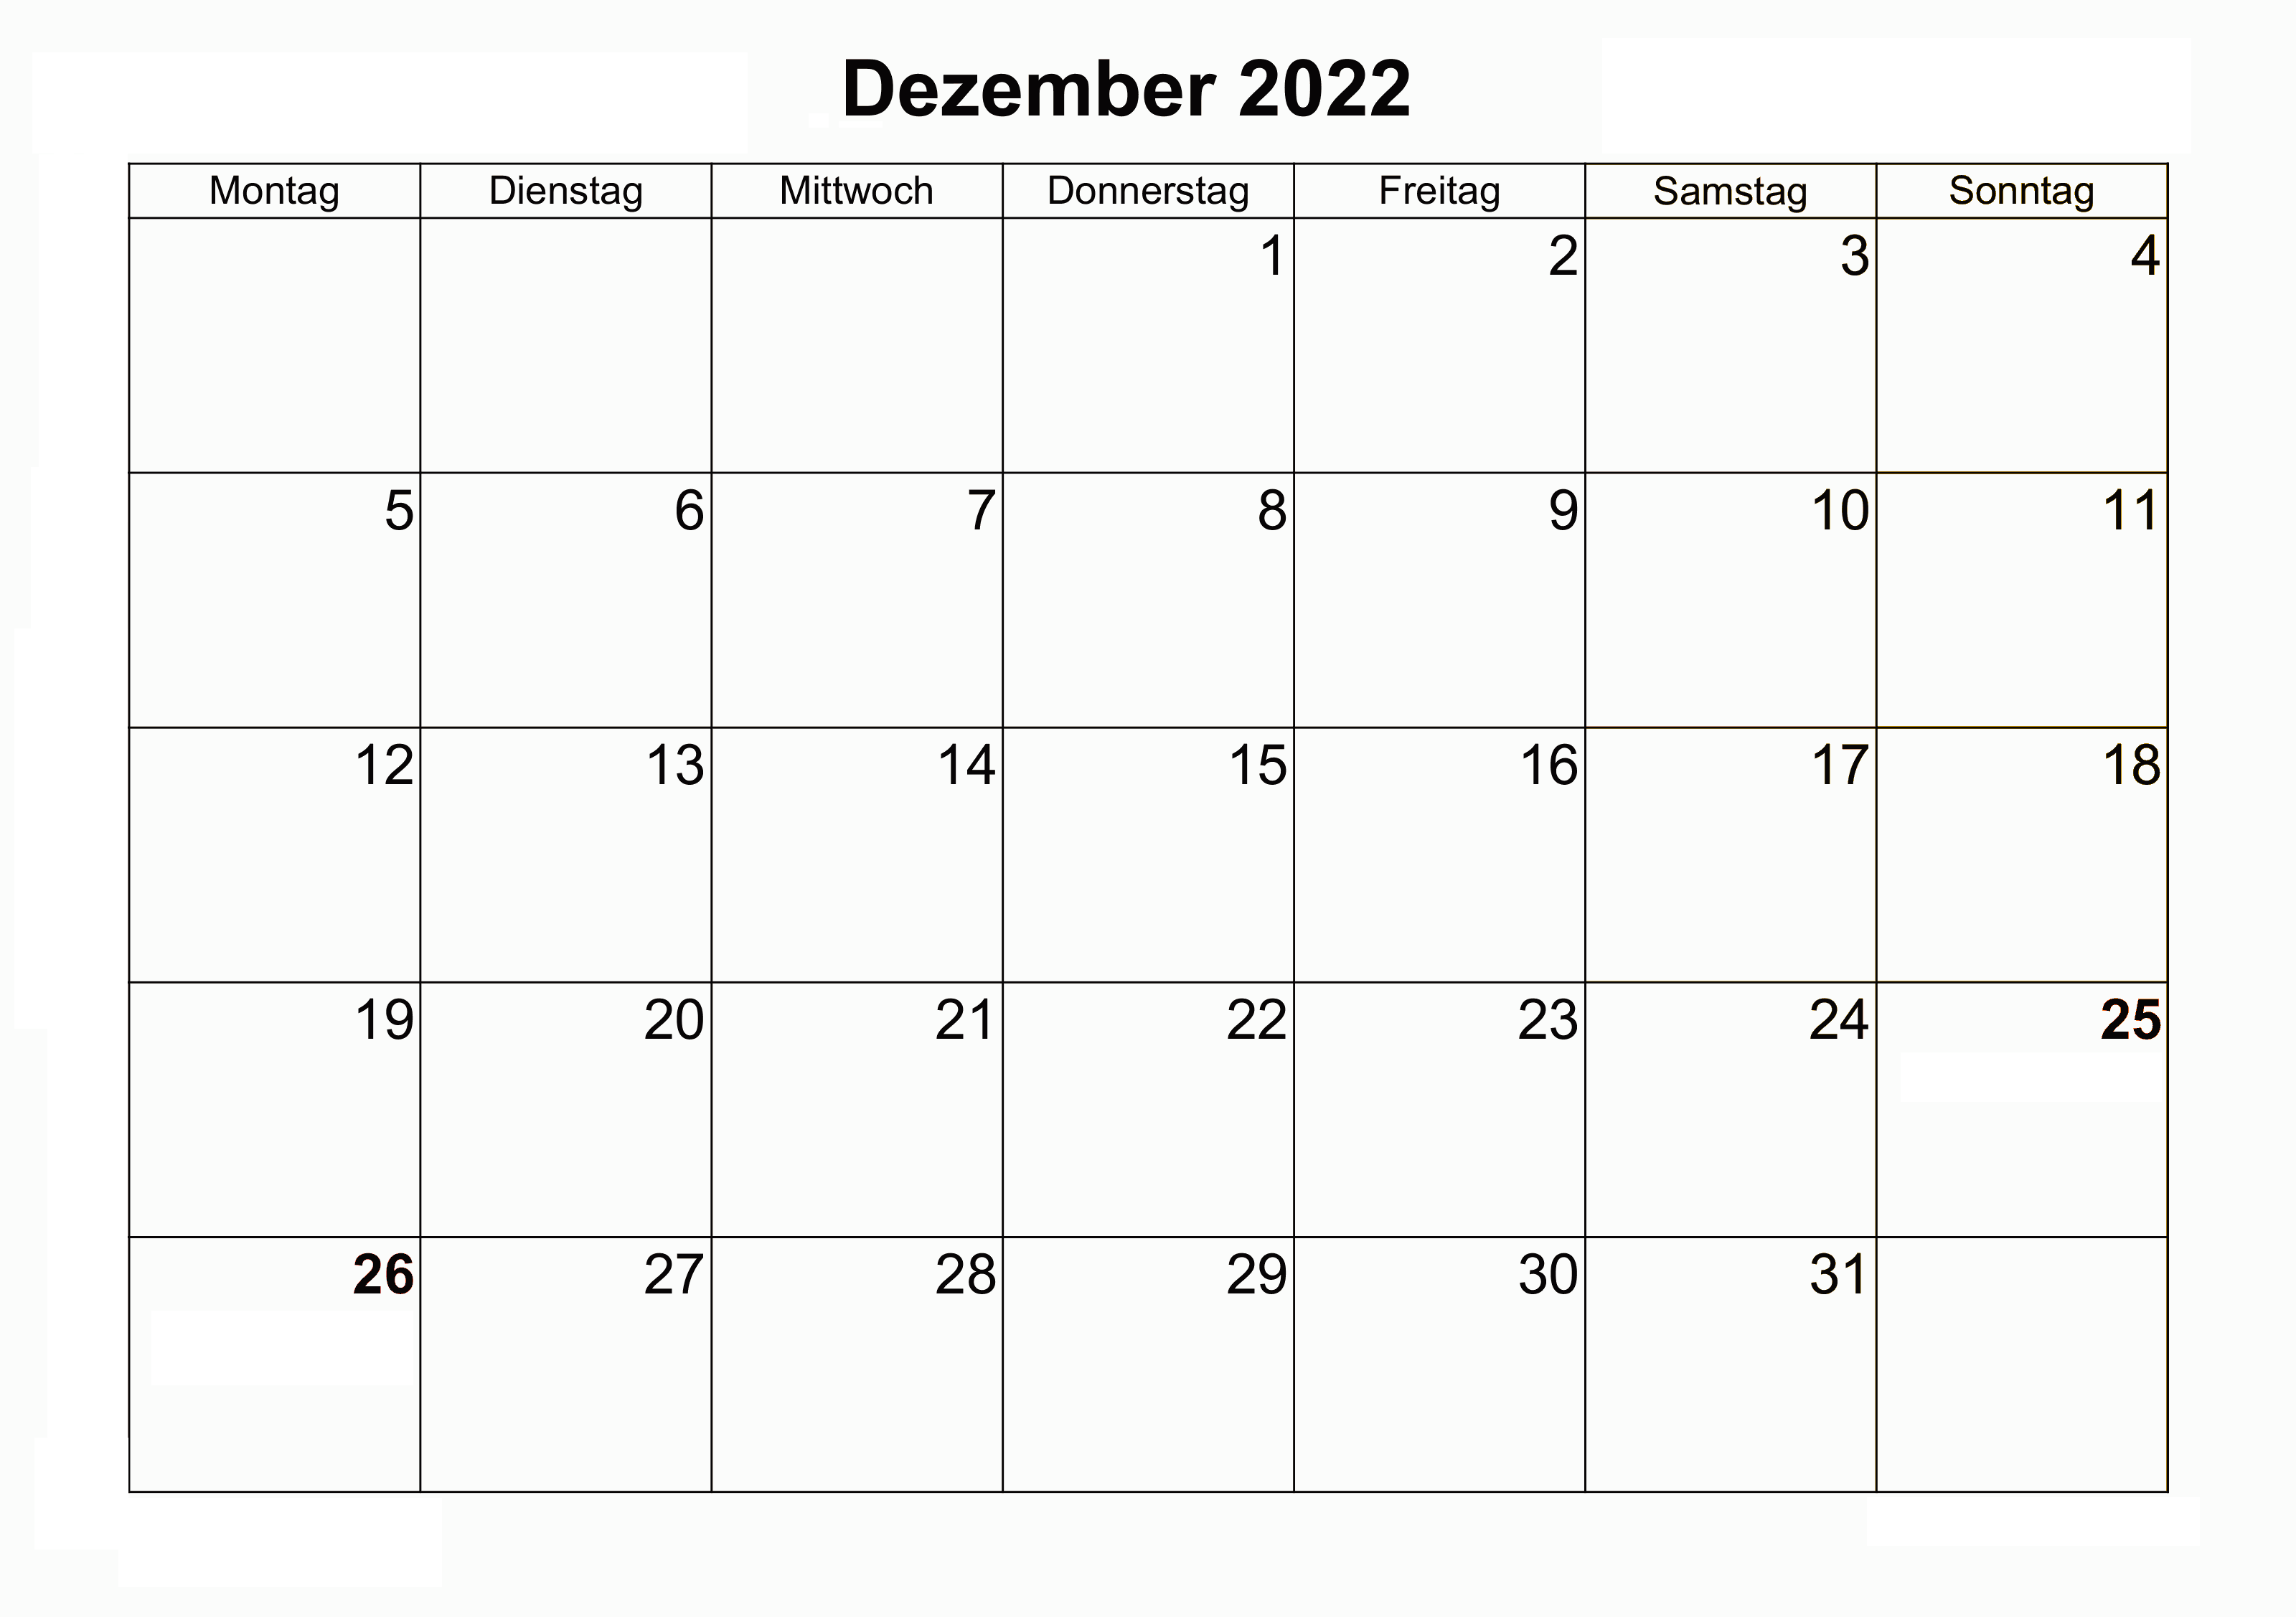 Dezember 2022 Kalender Ausdrucken